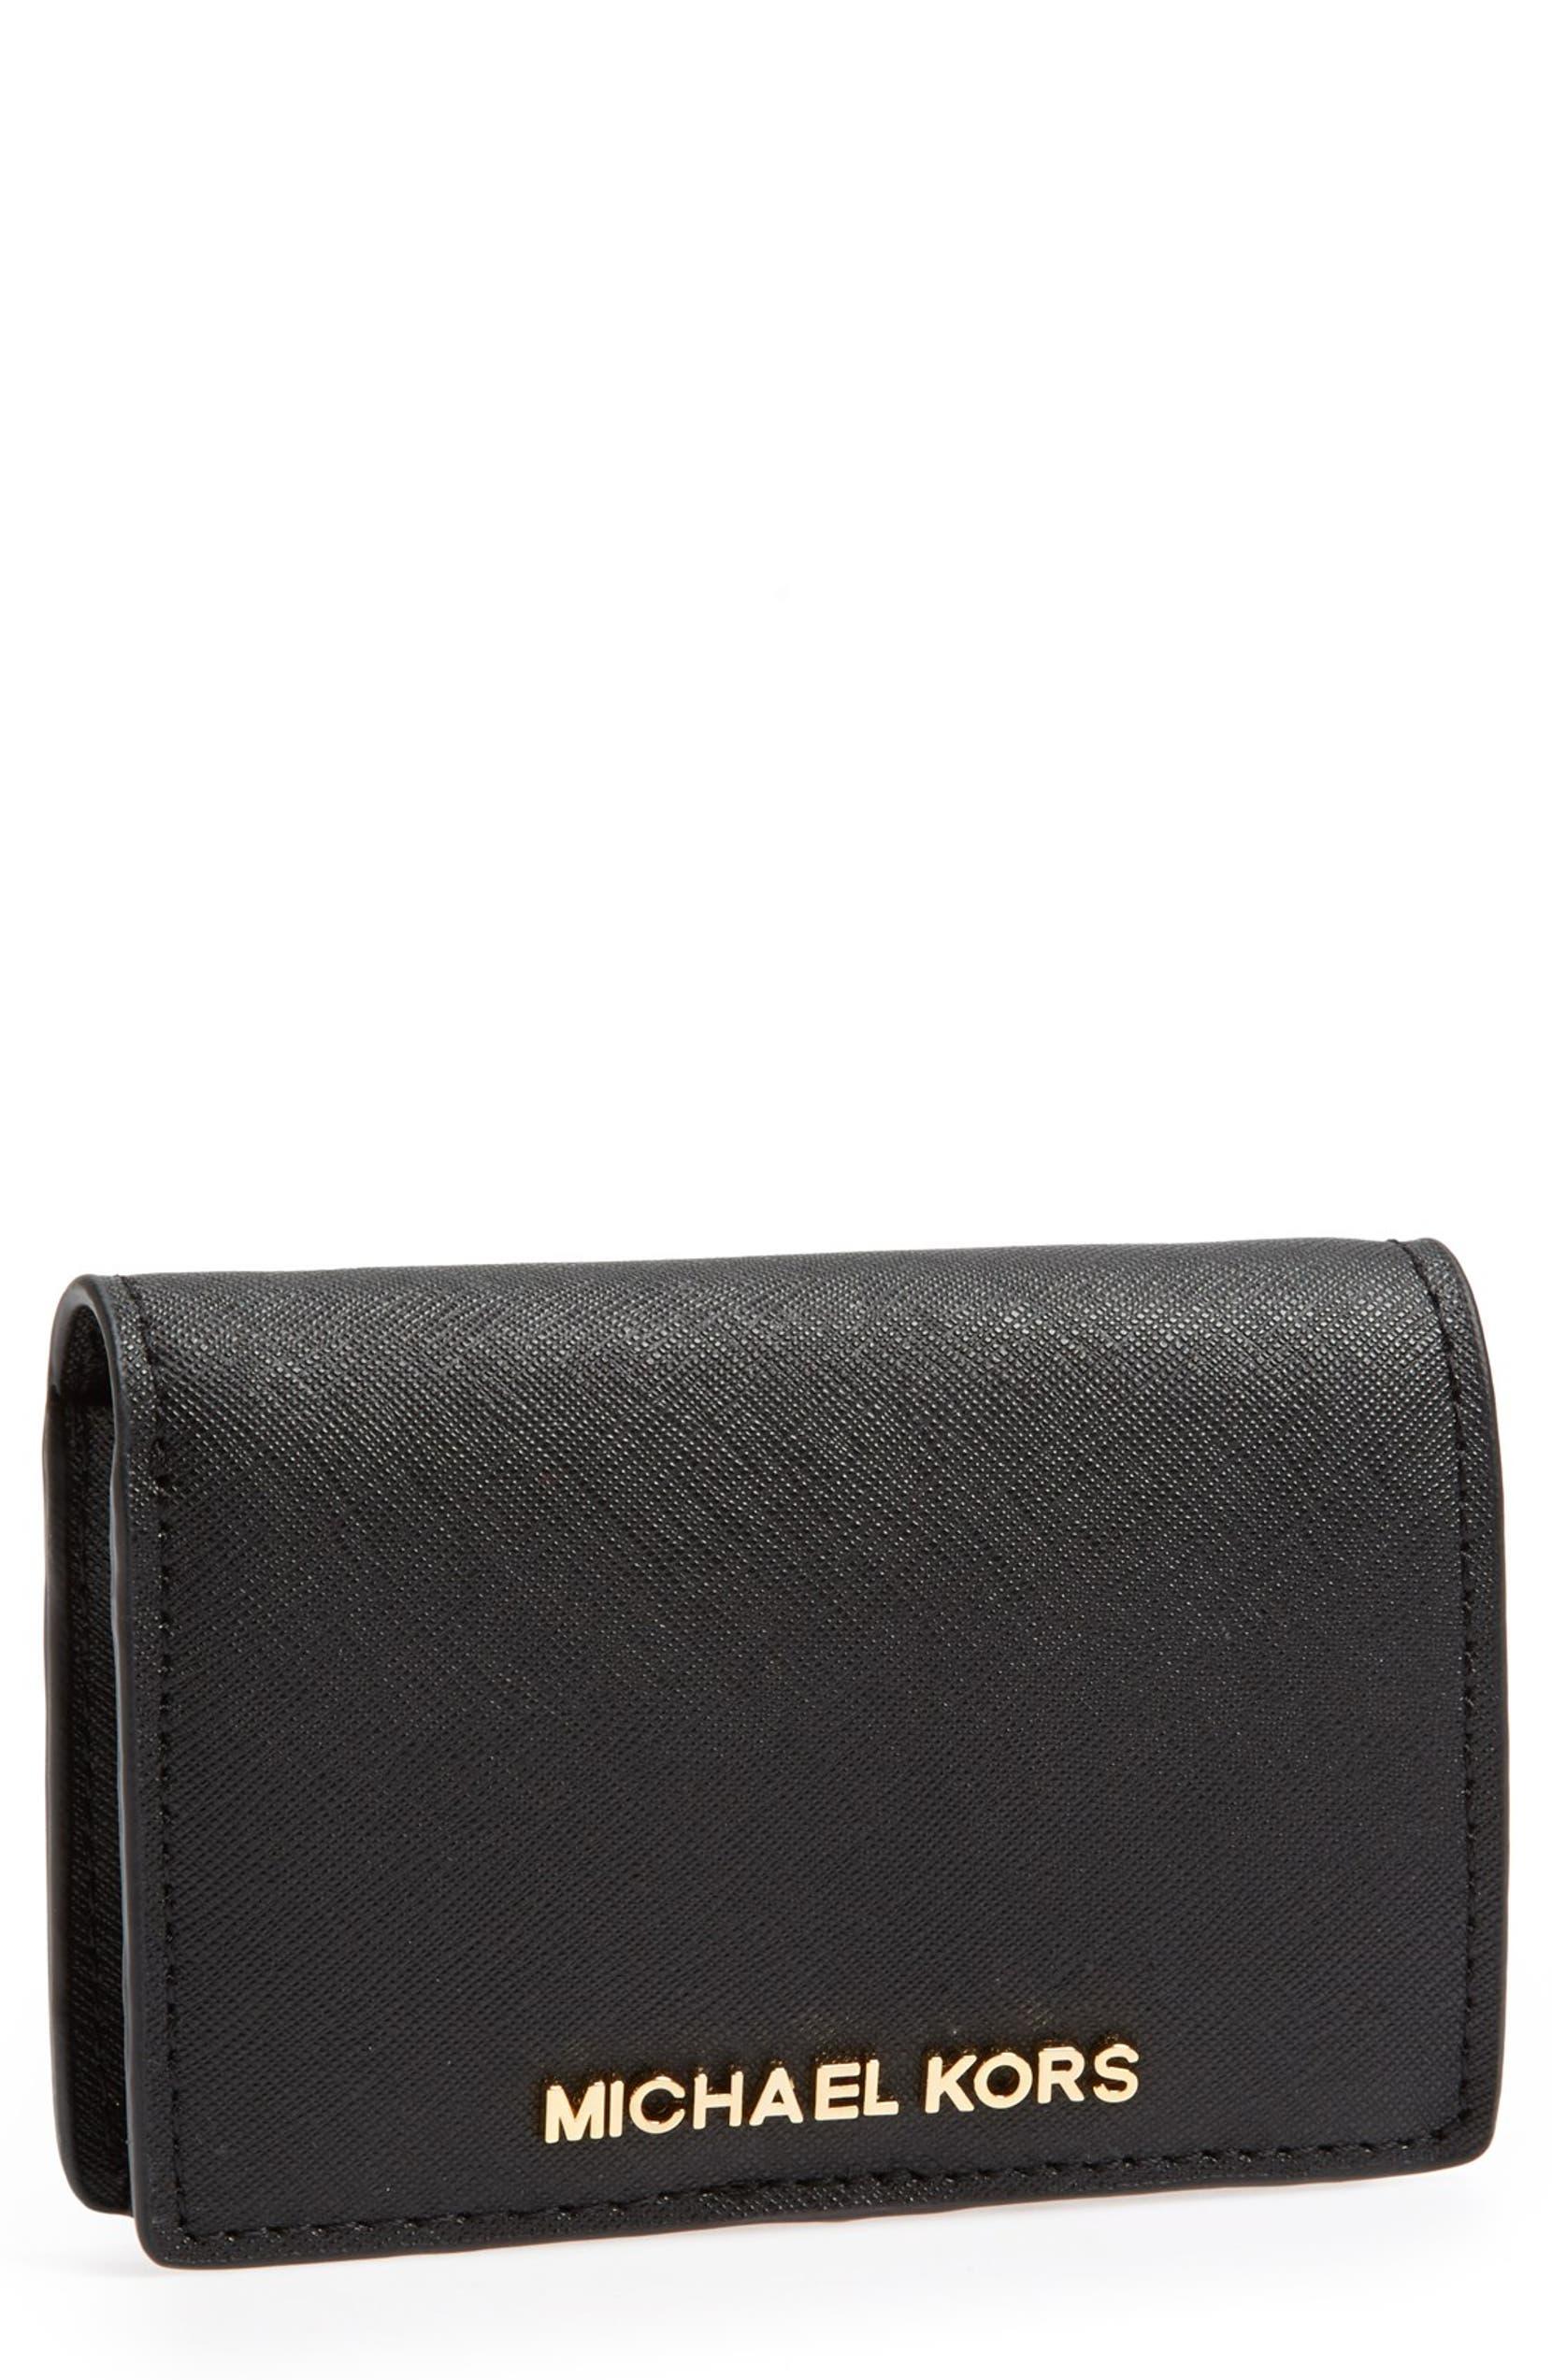 2ad9b7b99ad1 MICHAEL Michael Kors 'Jet Set - Slim' Saffiano Leather Wallet | Nordstrom